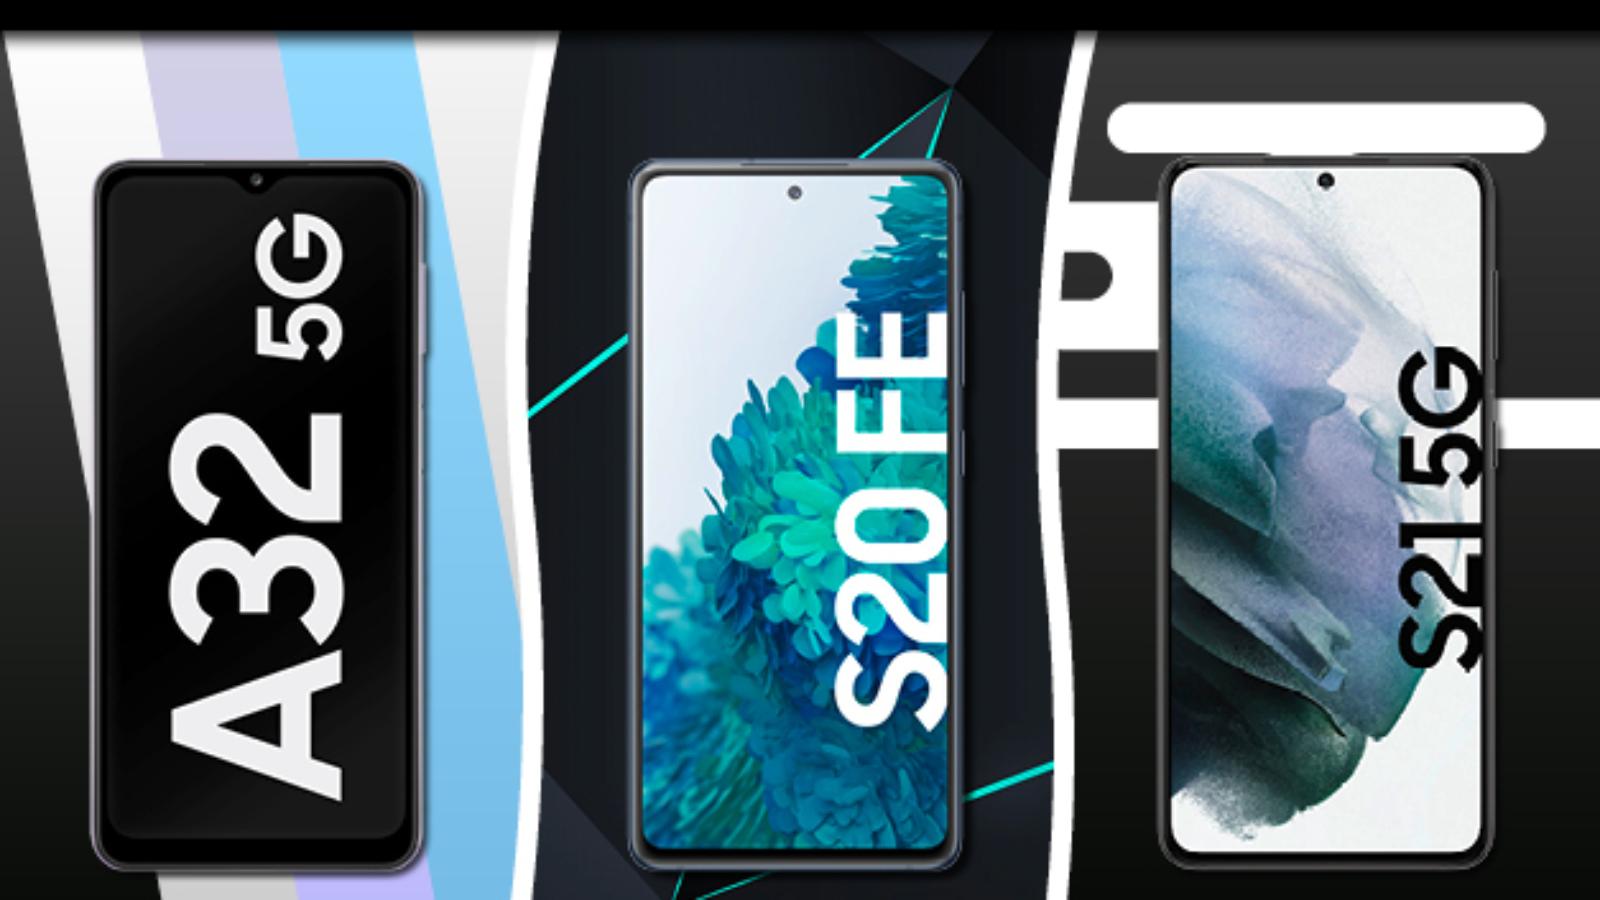 Kachel_Samsung-Neuheiten